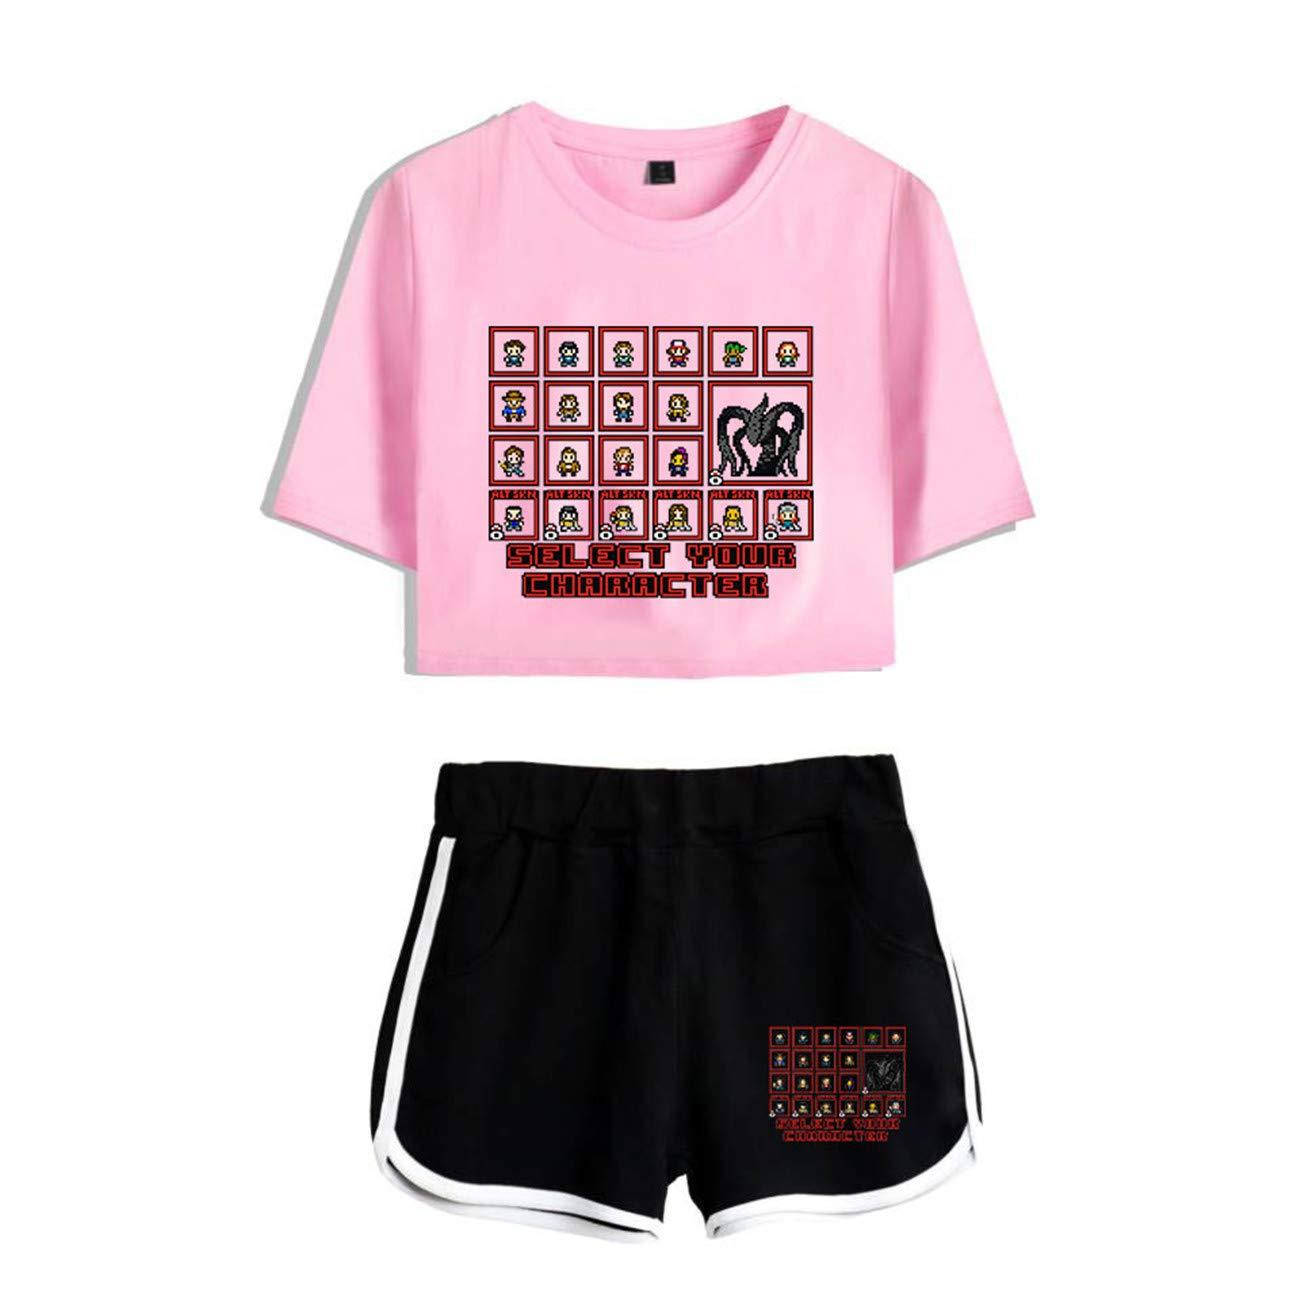 Stranger Things T-Shirt + Shorts 2 Pieces Set Stranger Things 2019 New Season Character Cartoon Printed Summer Sports Tracksuit